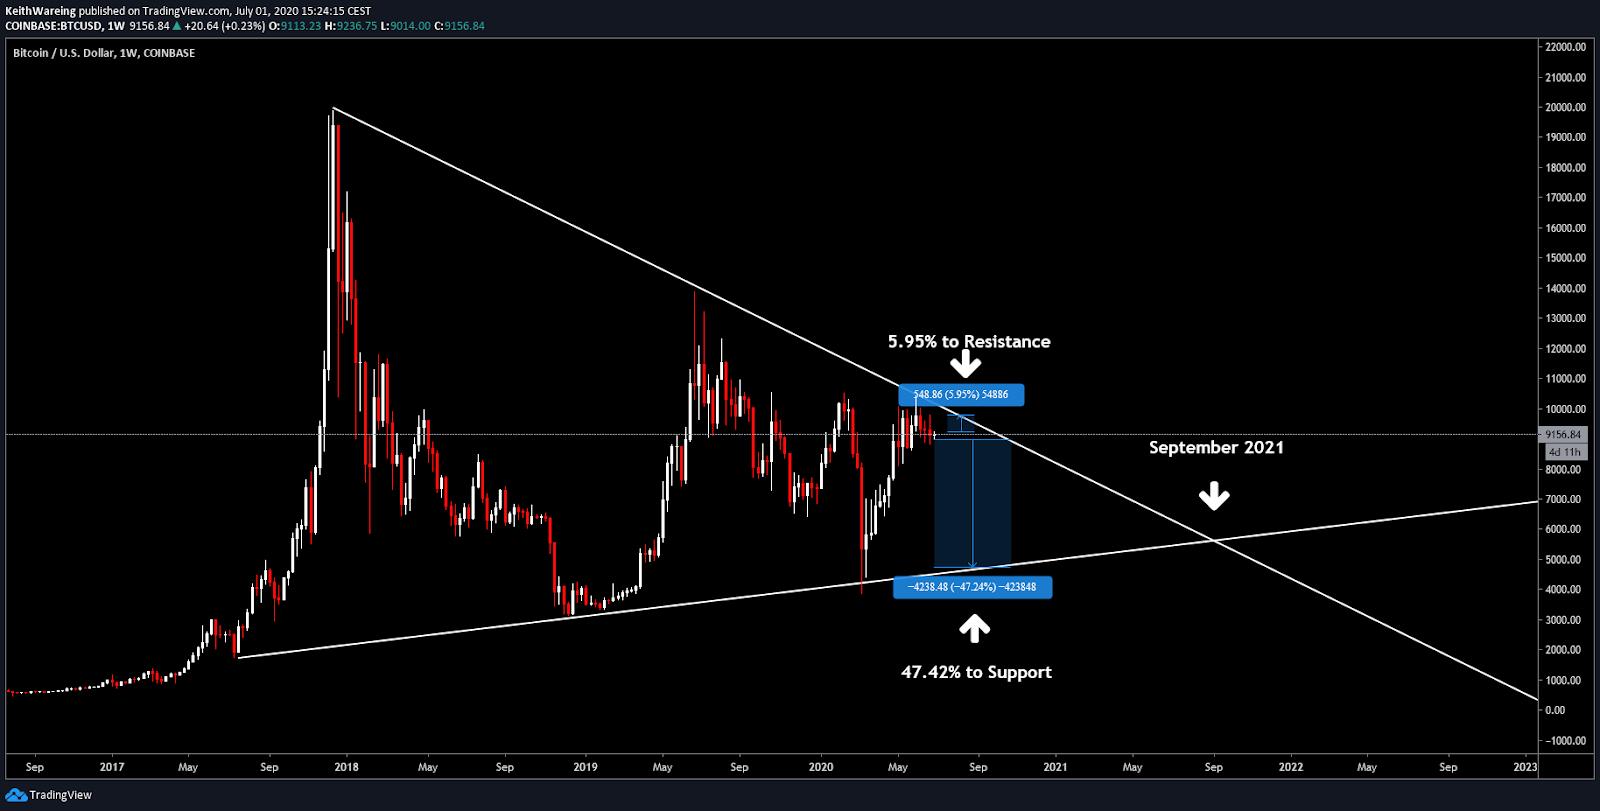 BTC/USD 1-week chart. Source: TradingView